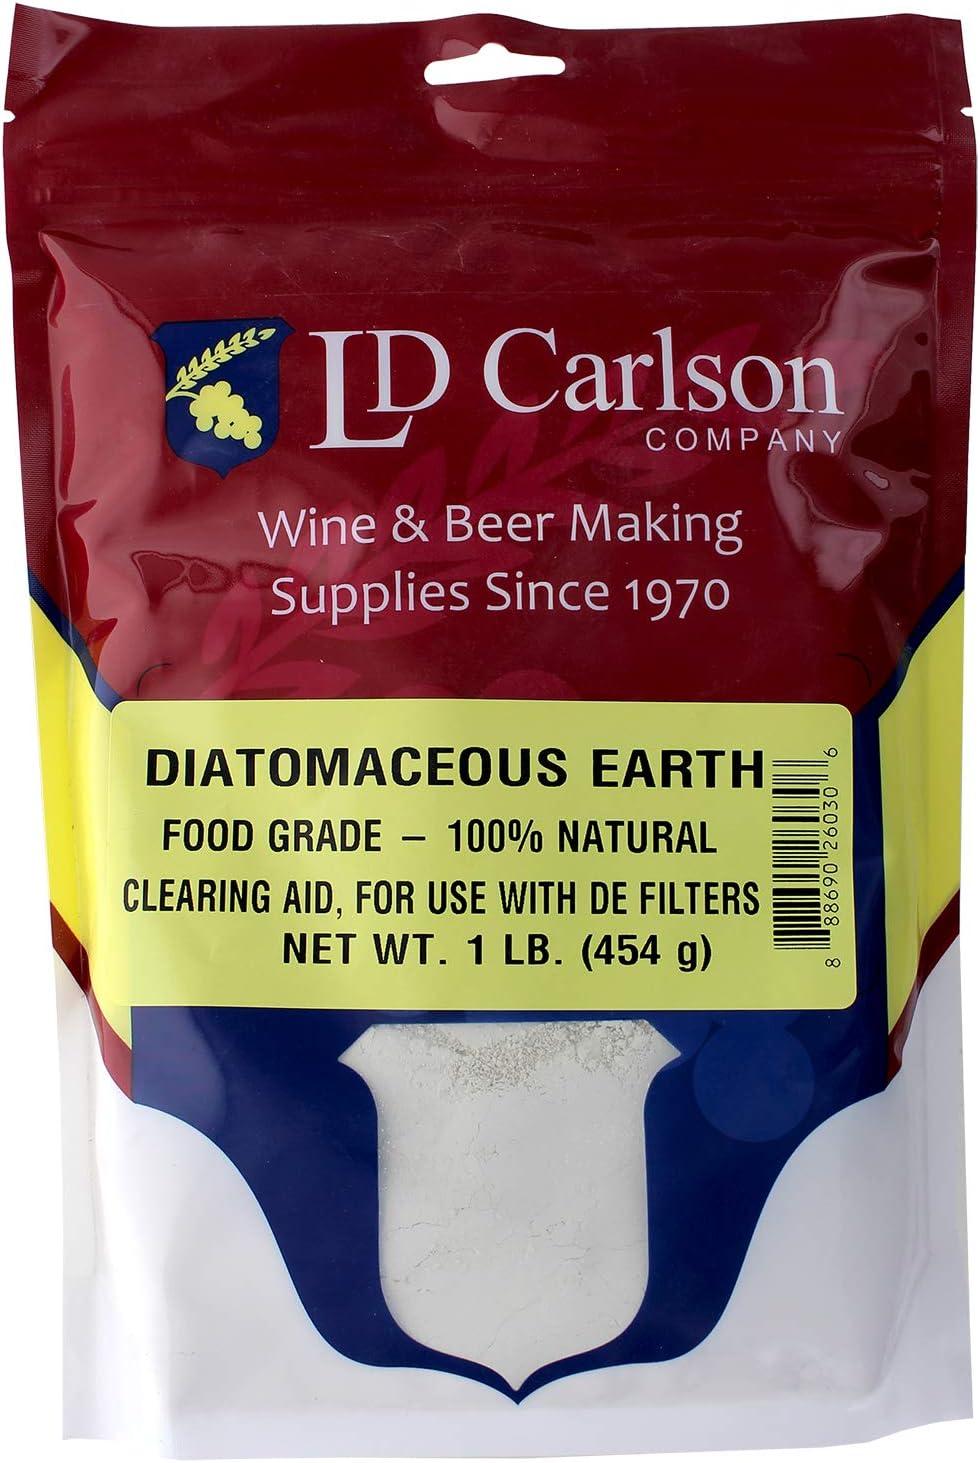 Diatomaceous Earth - Food Grade, 100% Natural - 1 lb